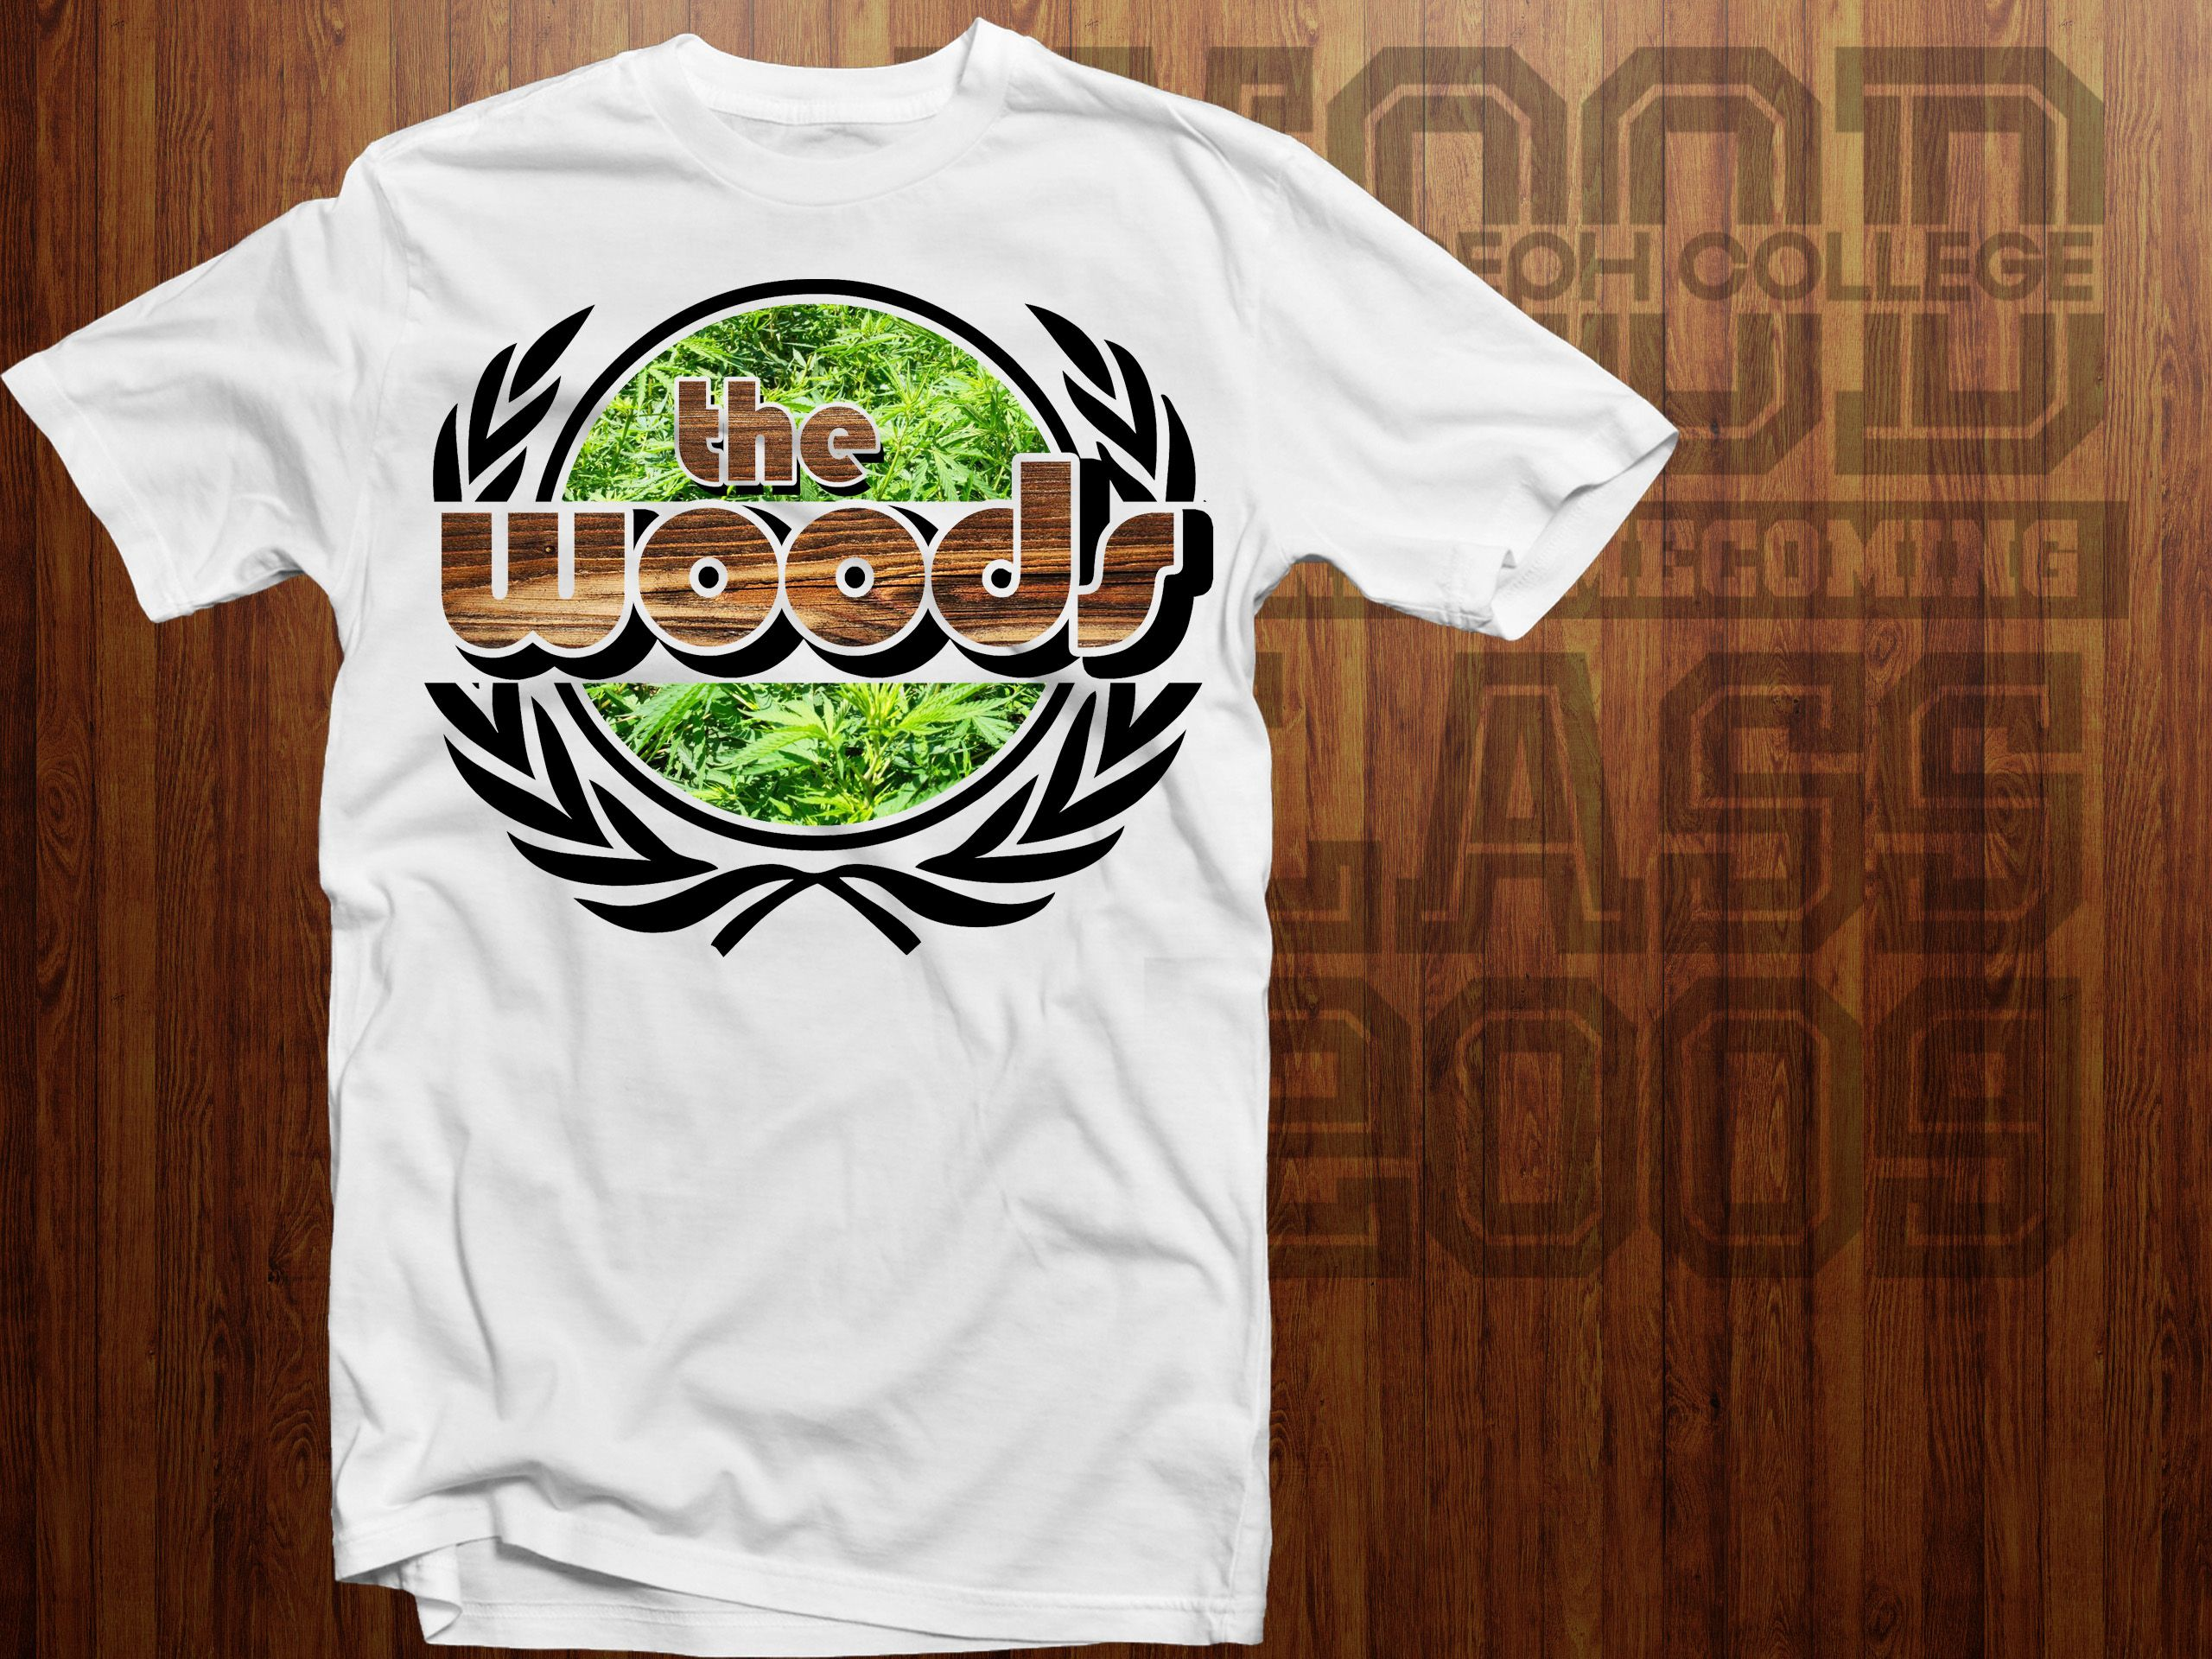 Tshirt design for alumni homecoming - Alumni Homecoming Batch 09 Wood First 5 Years Shirt Design